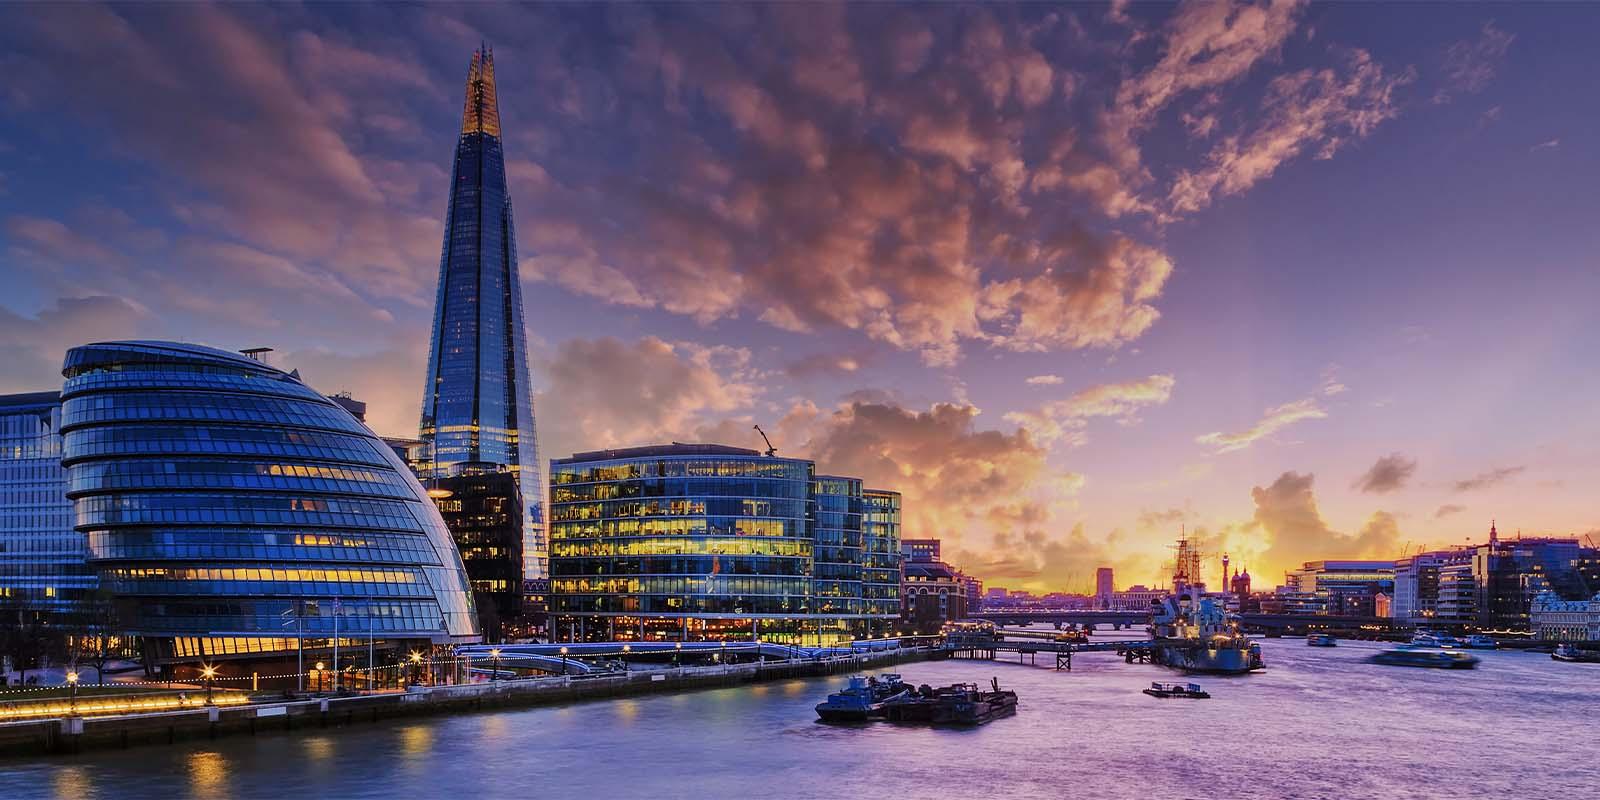 Thames River in London, United Kingdom.